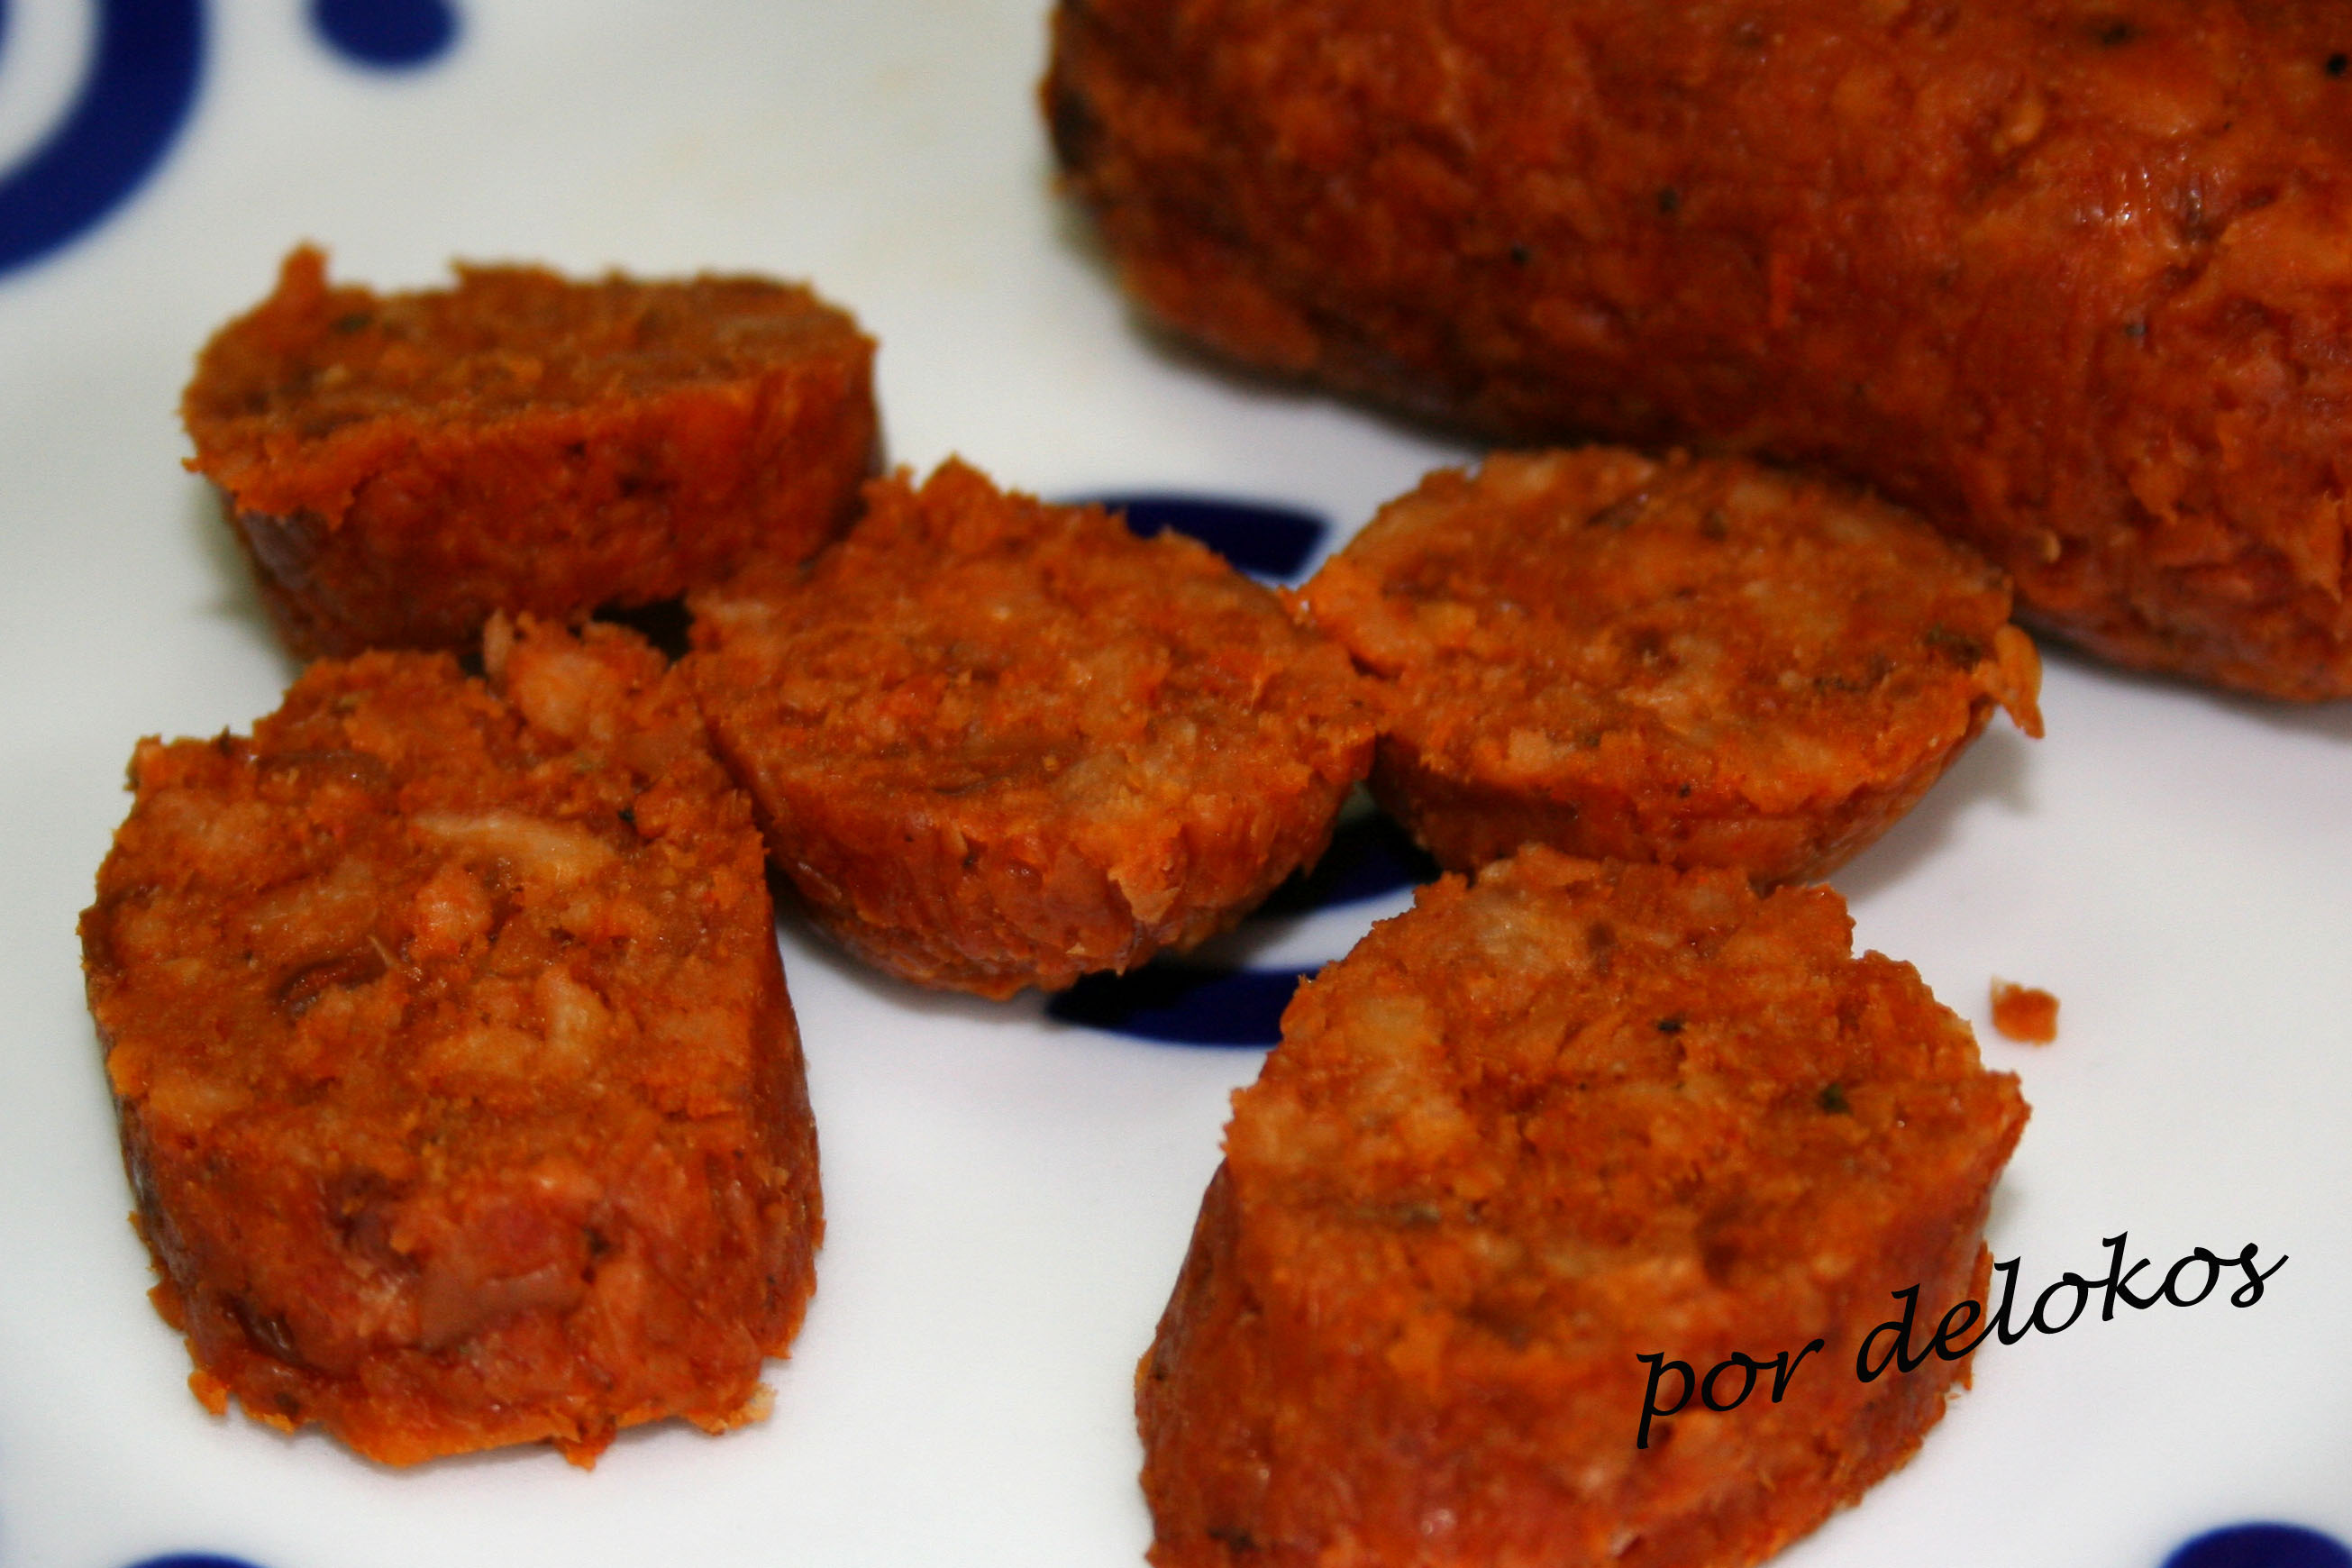 Chorizo Vegetariano Delokos